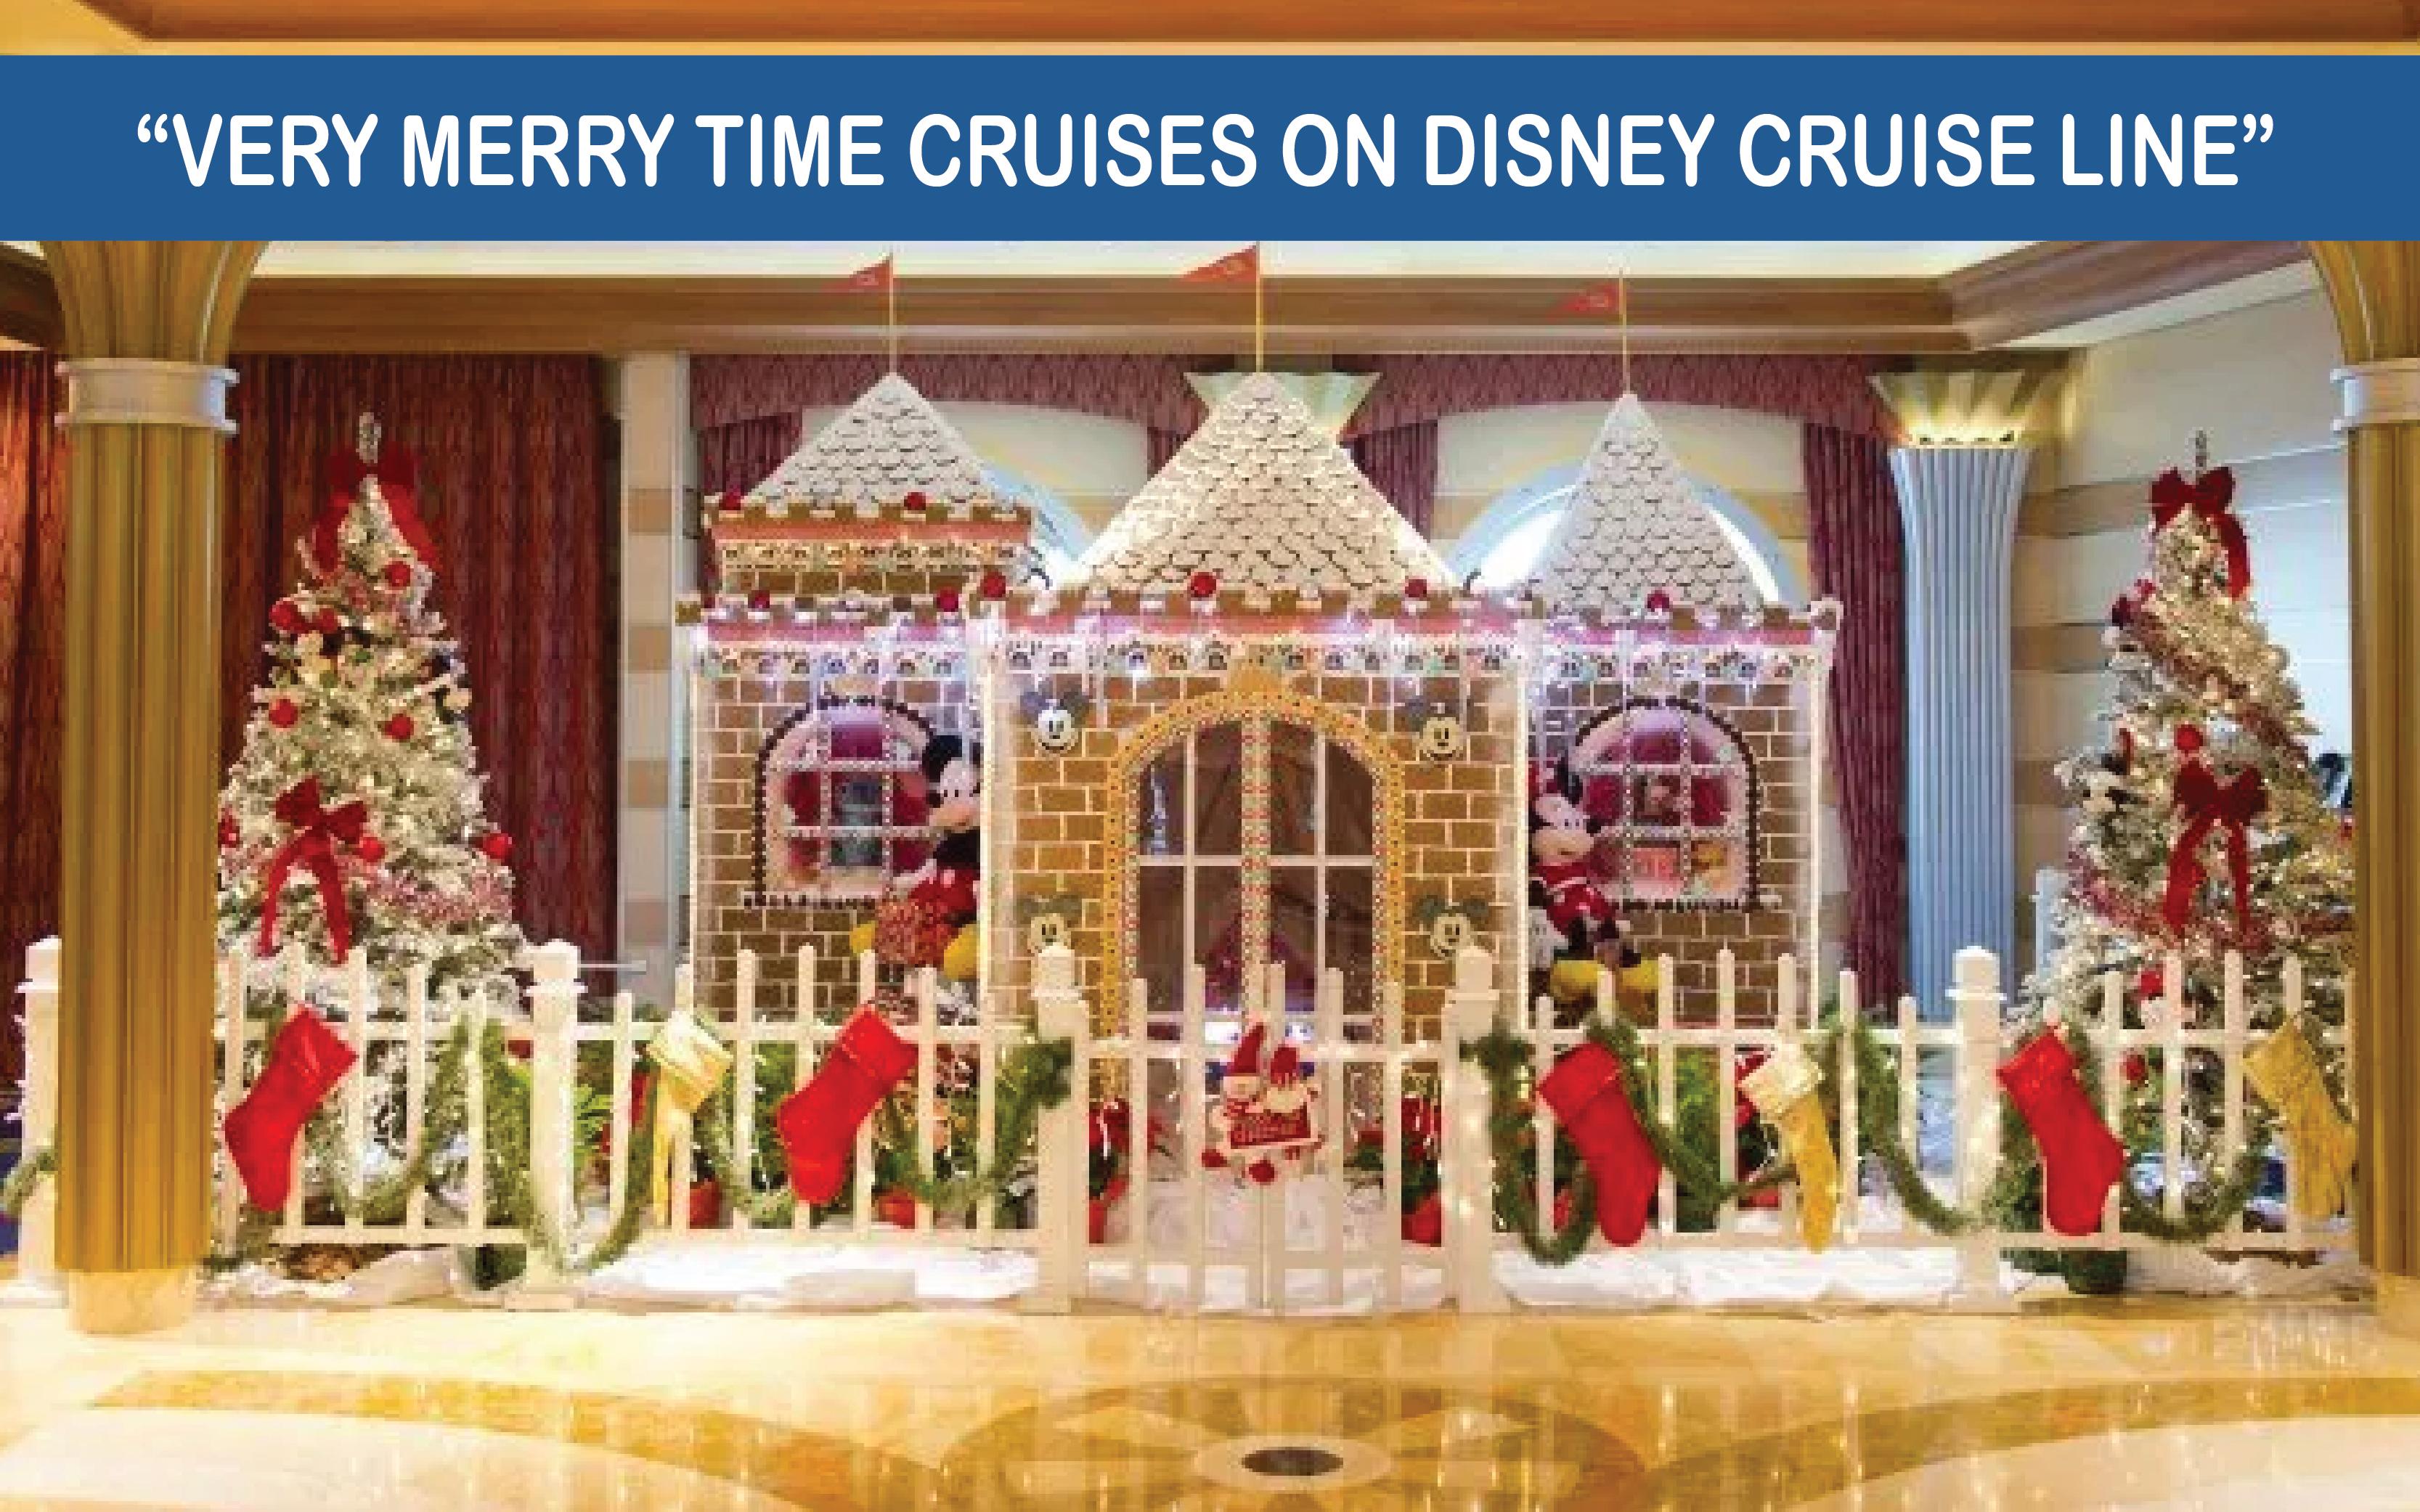 Very-Merrytime-Cruises-on-Disney-Cruise-Line